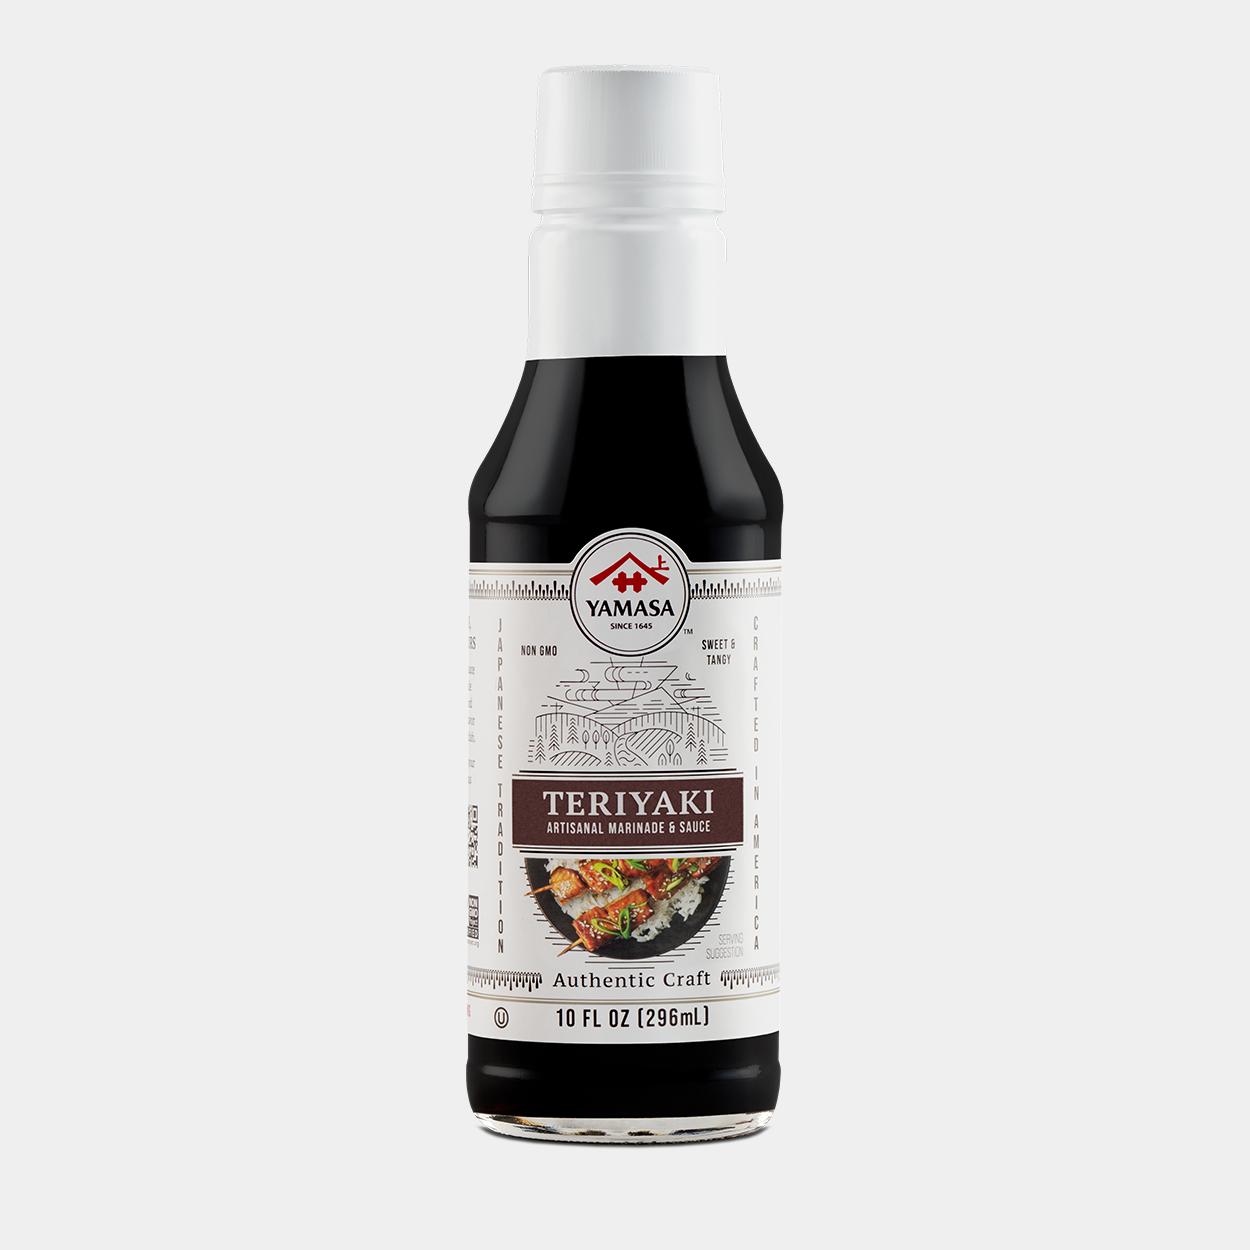 Image of a bottle of Yamasa Teriyaki Artisanal Marinade & Sauce.